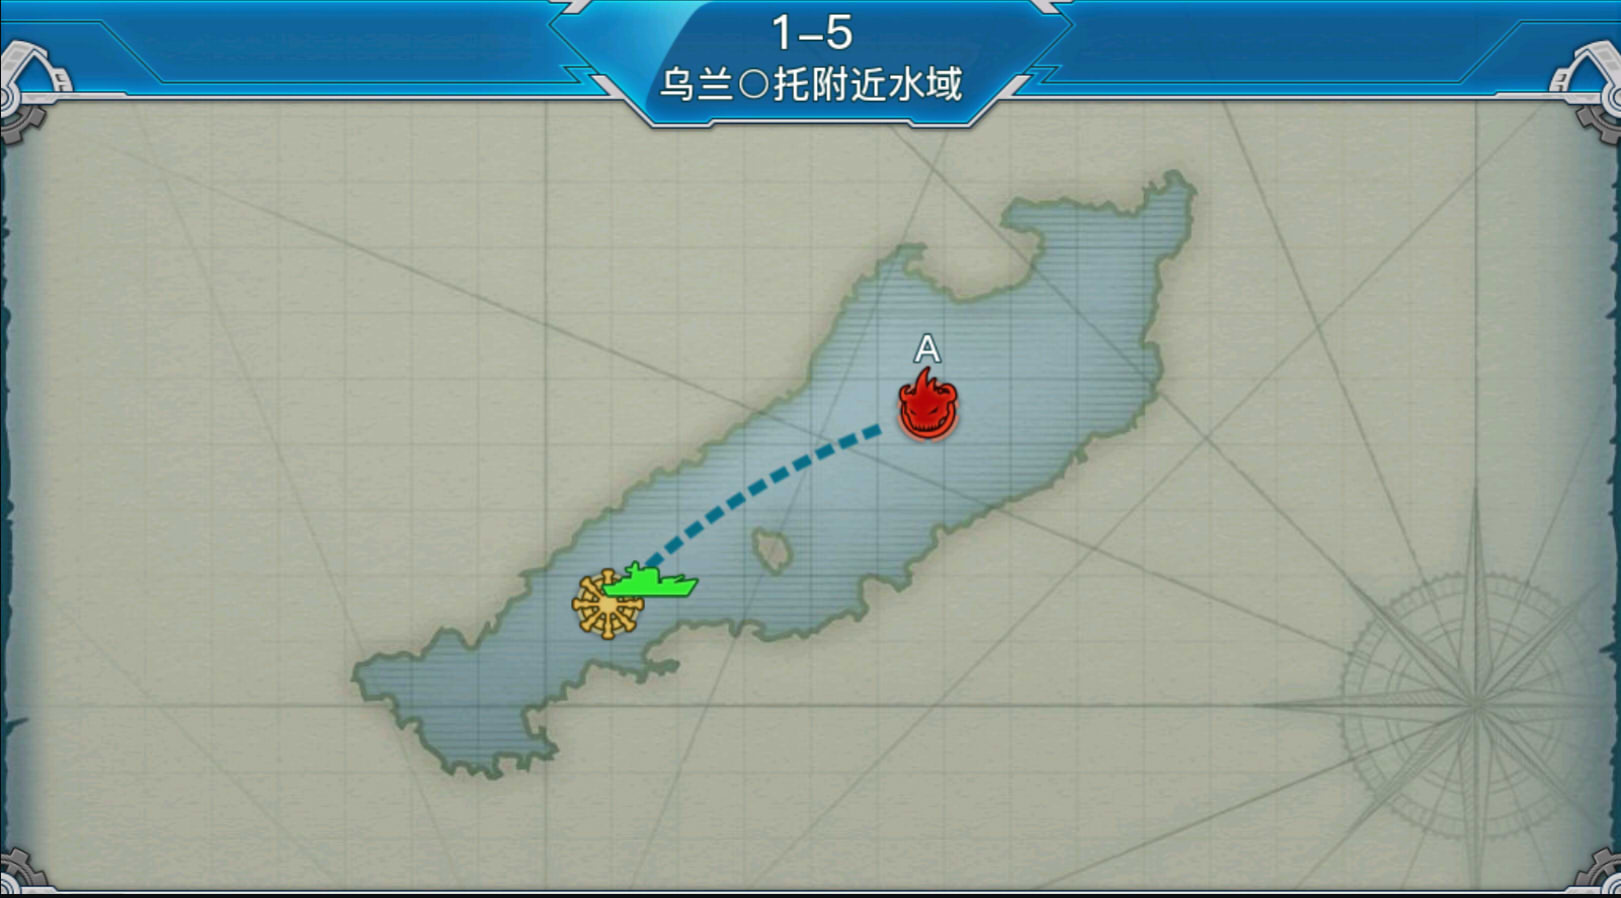 1-5 map.jpg